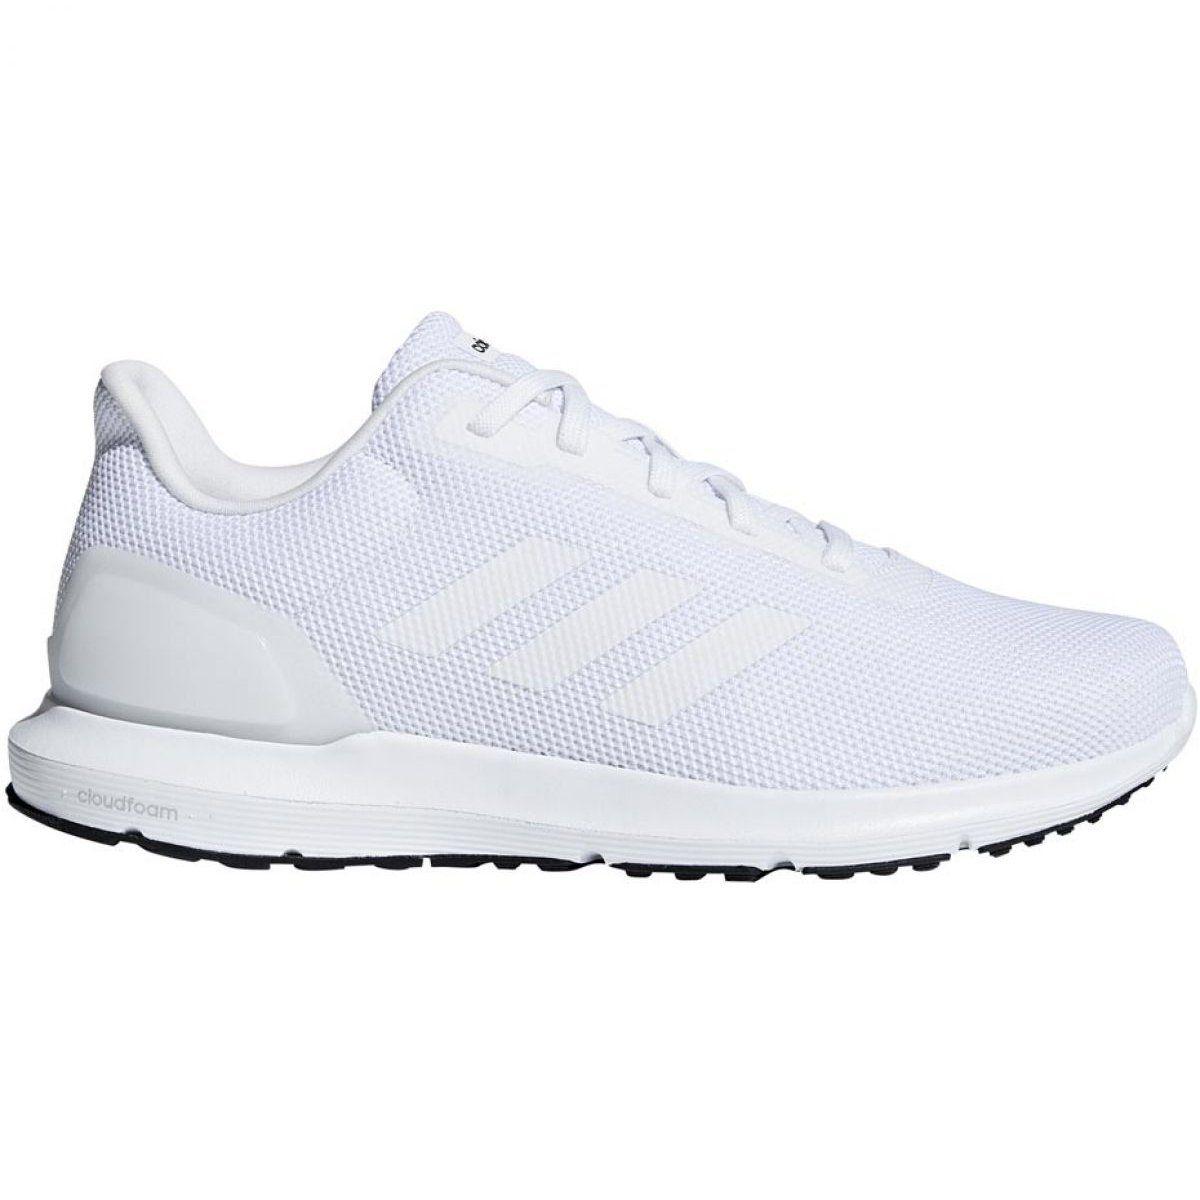 Buty Biegowe Adidas Cosmic 2 M F34876 Biale Shoes Adidas Adidas Running Shoes